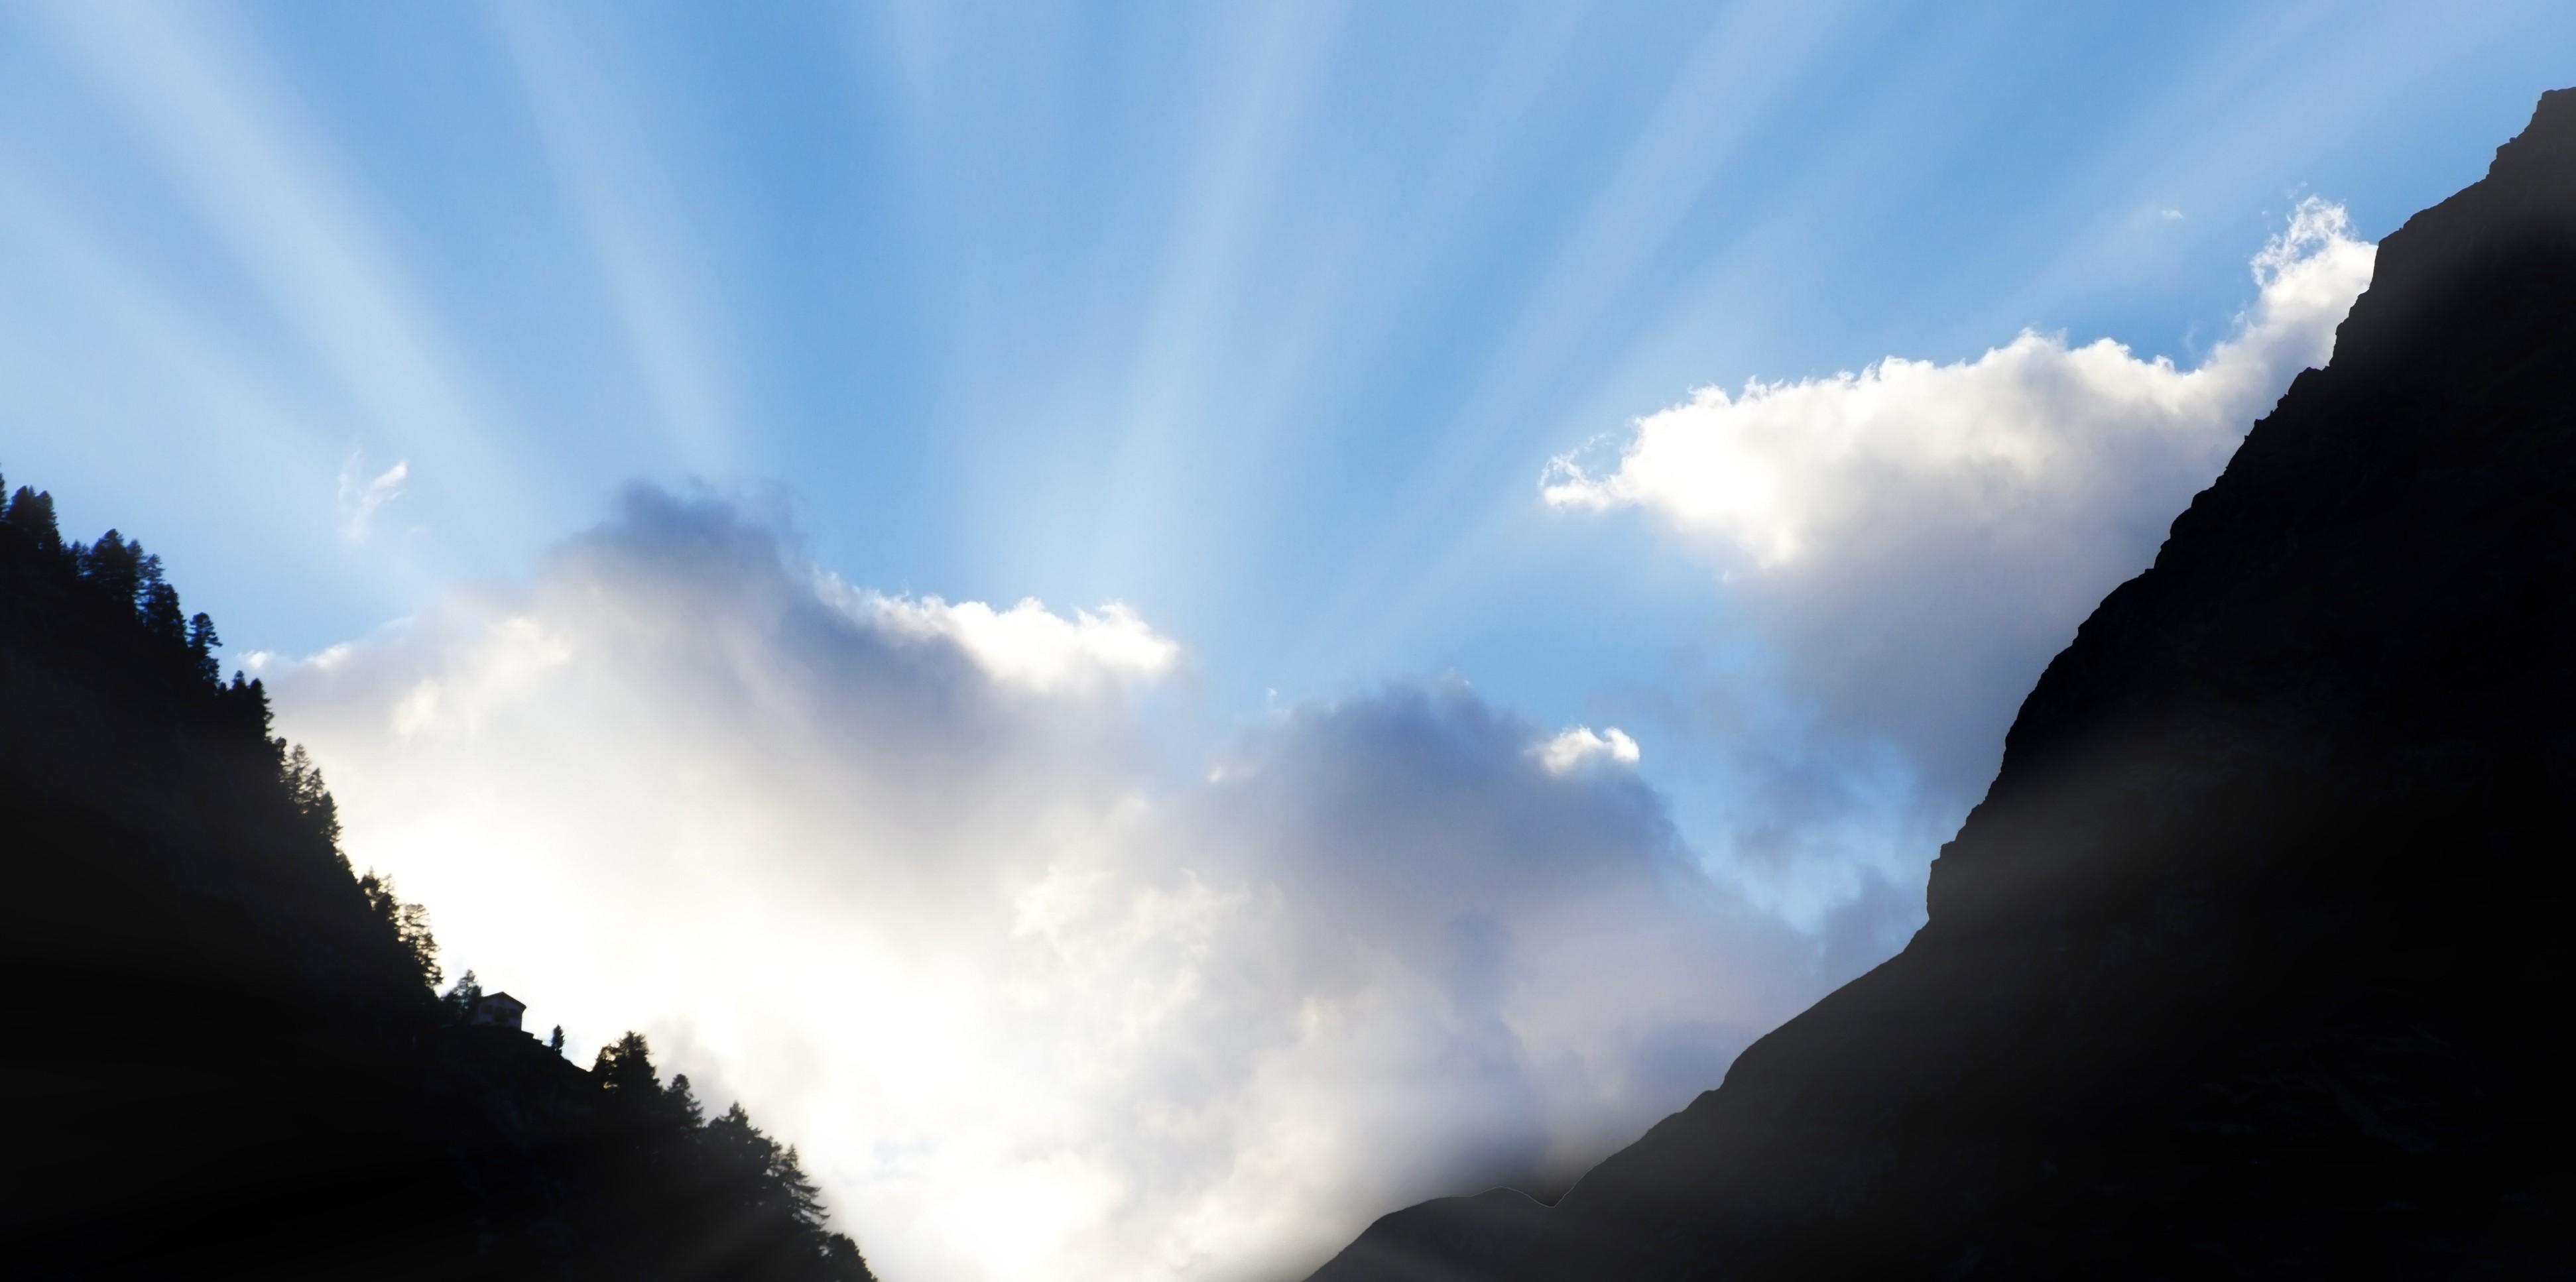 sun shining through clouds between two mountains